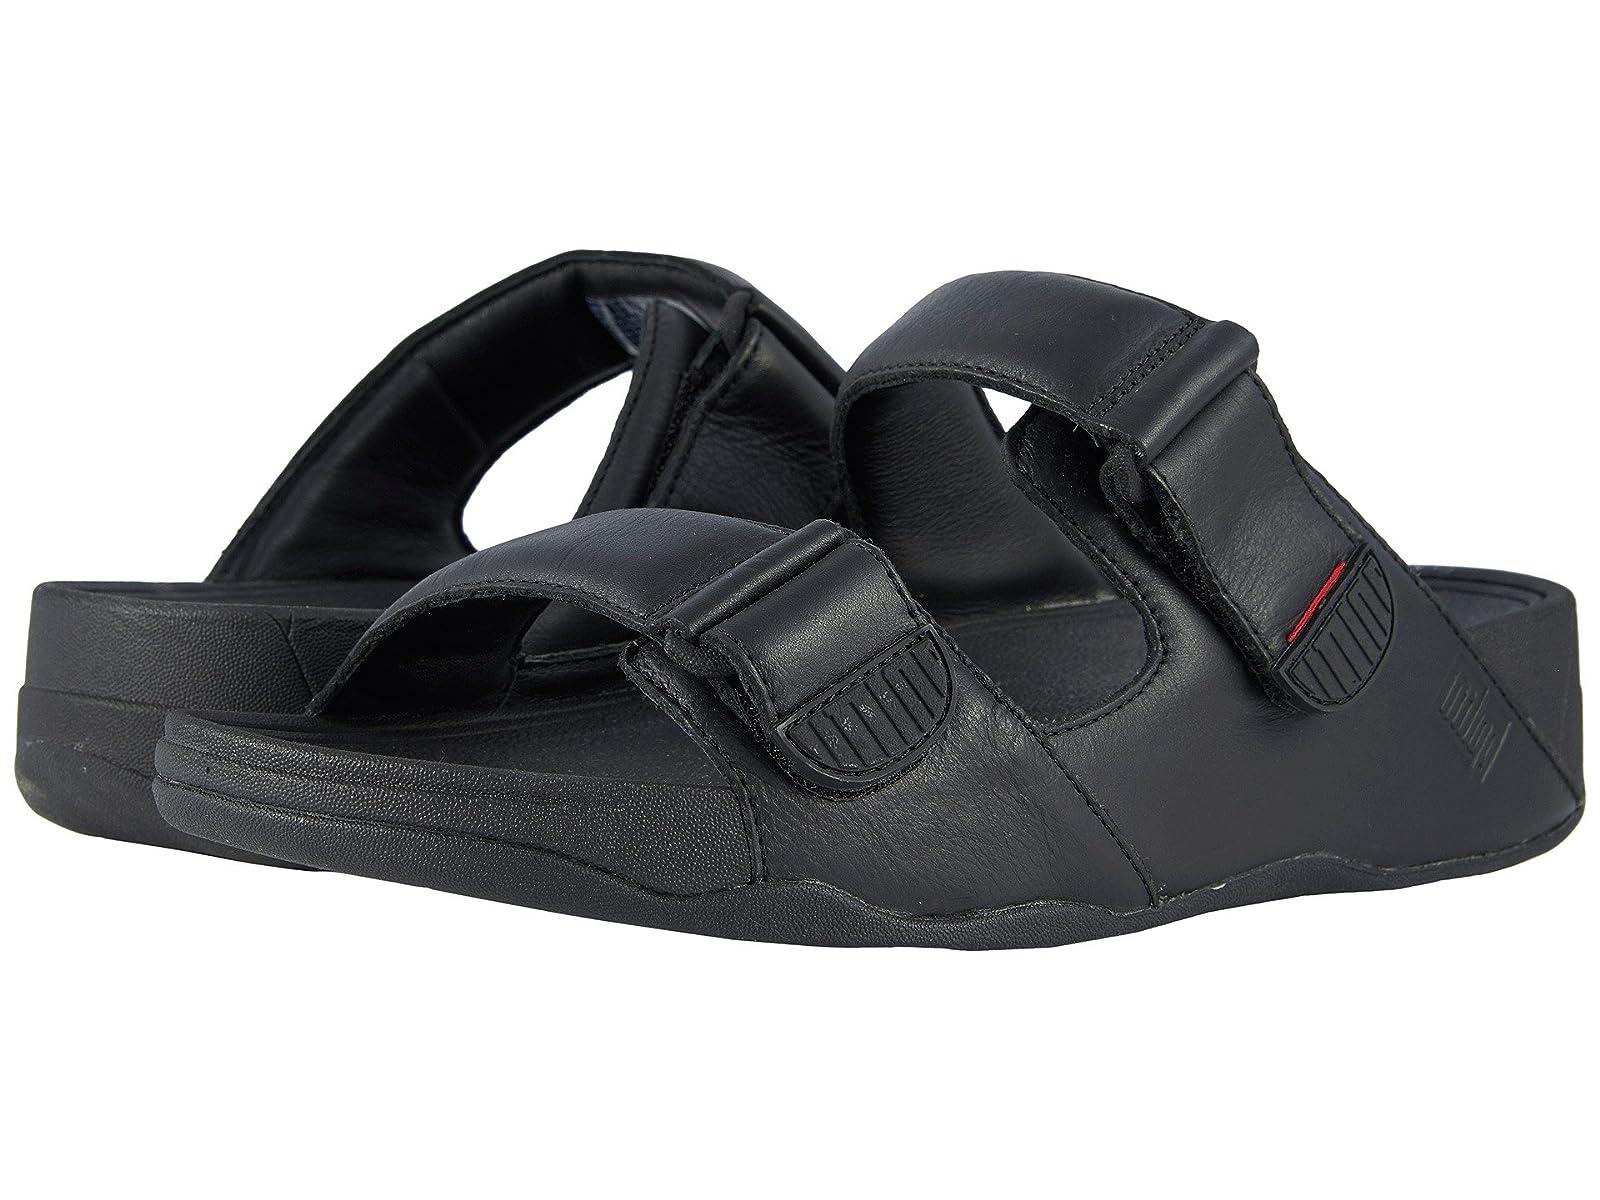 FitFlop Gogh Moc SlideAtmospheric grades have affordable shoes